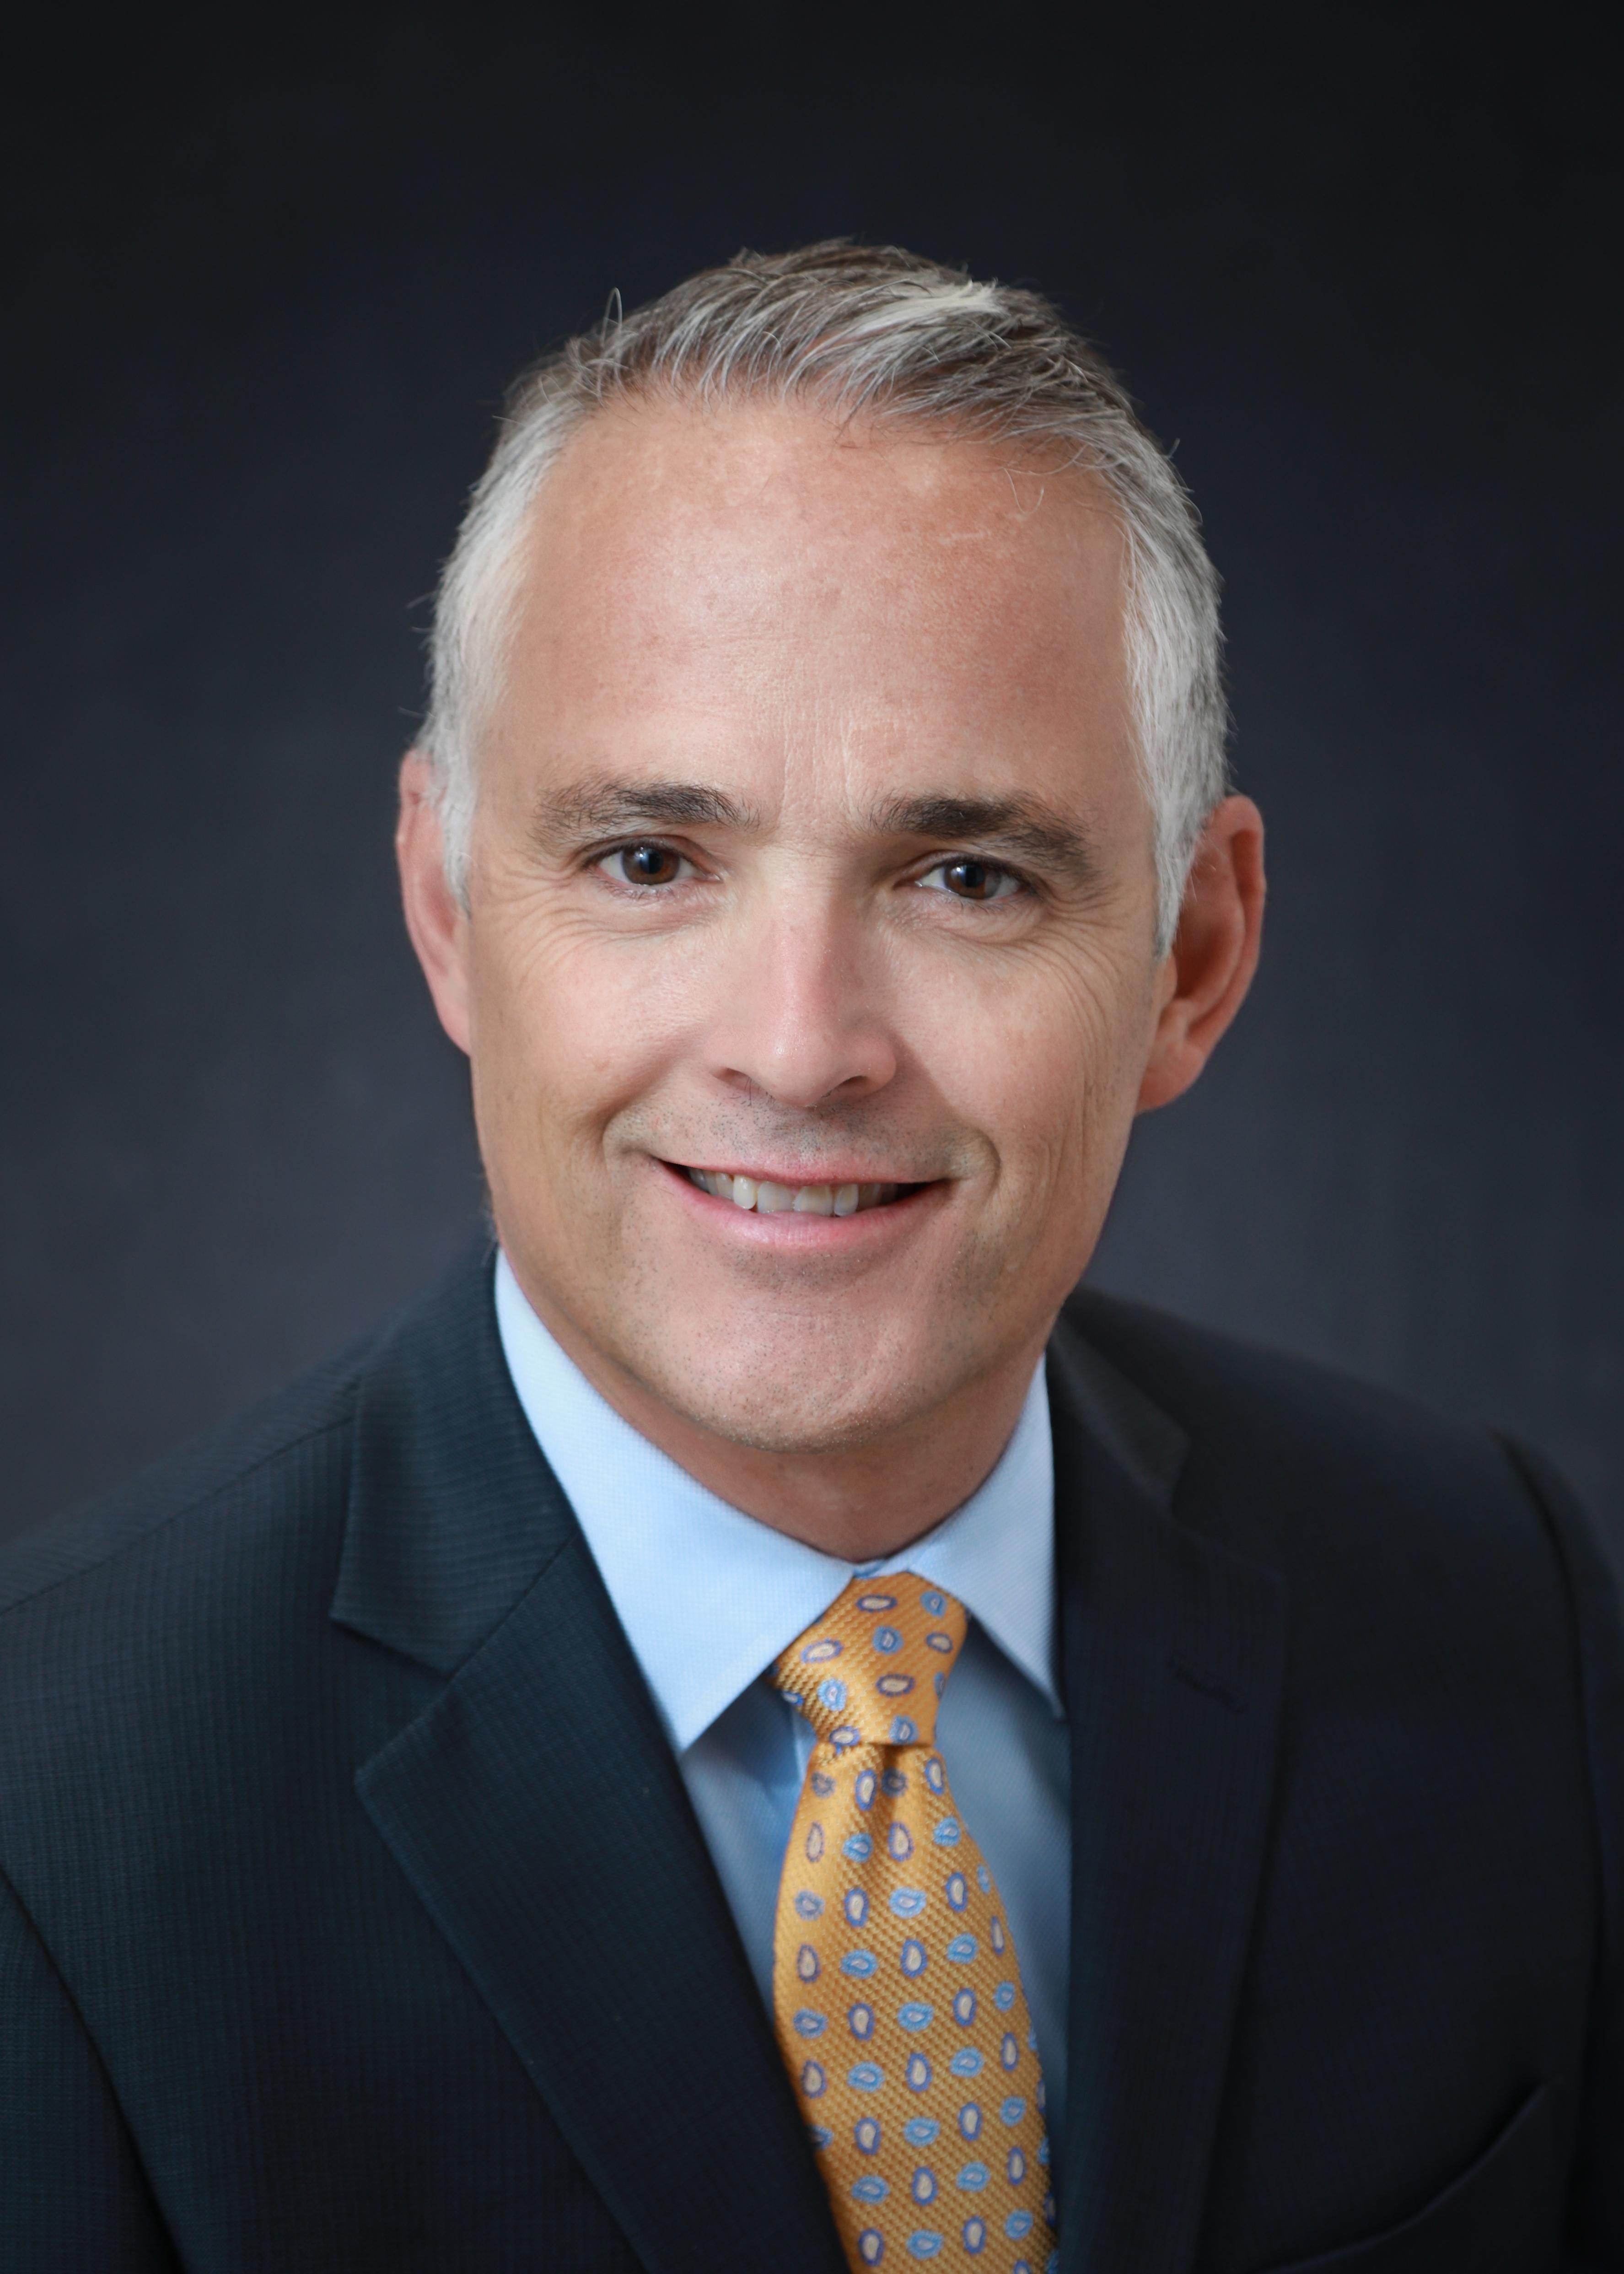 Matt Langton, EVP Sales, Purchasing